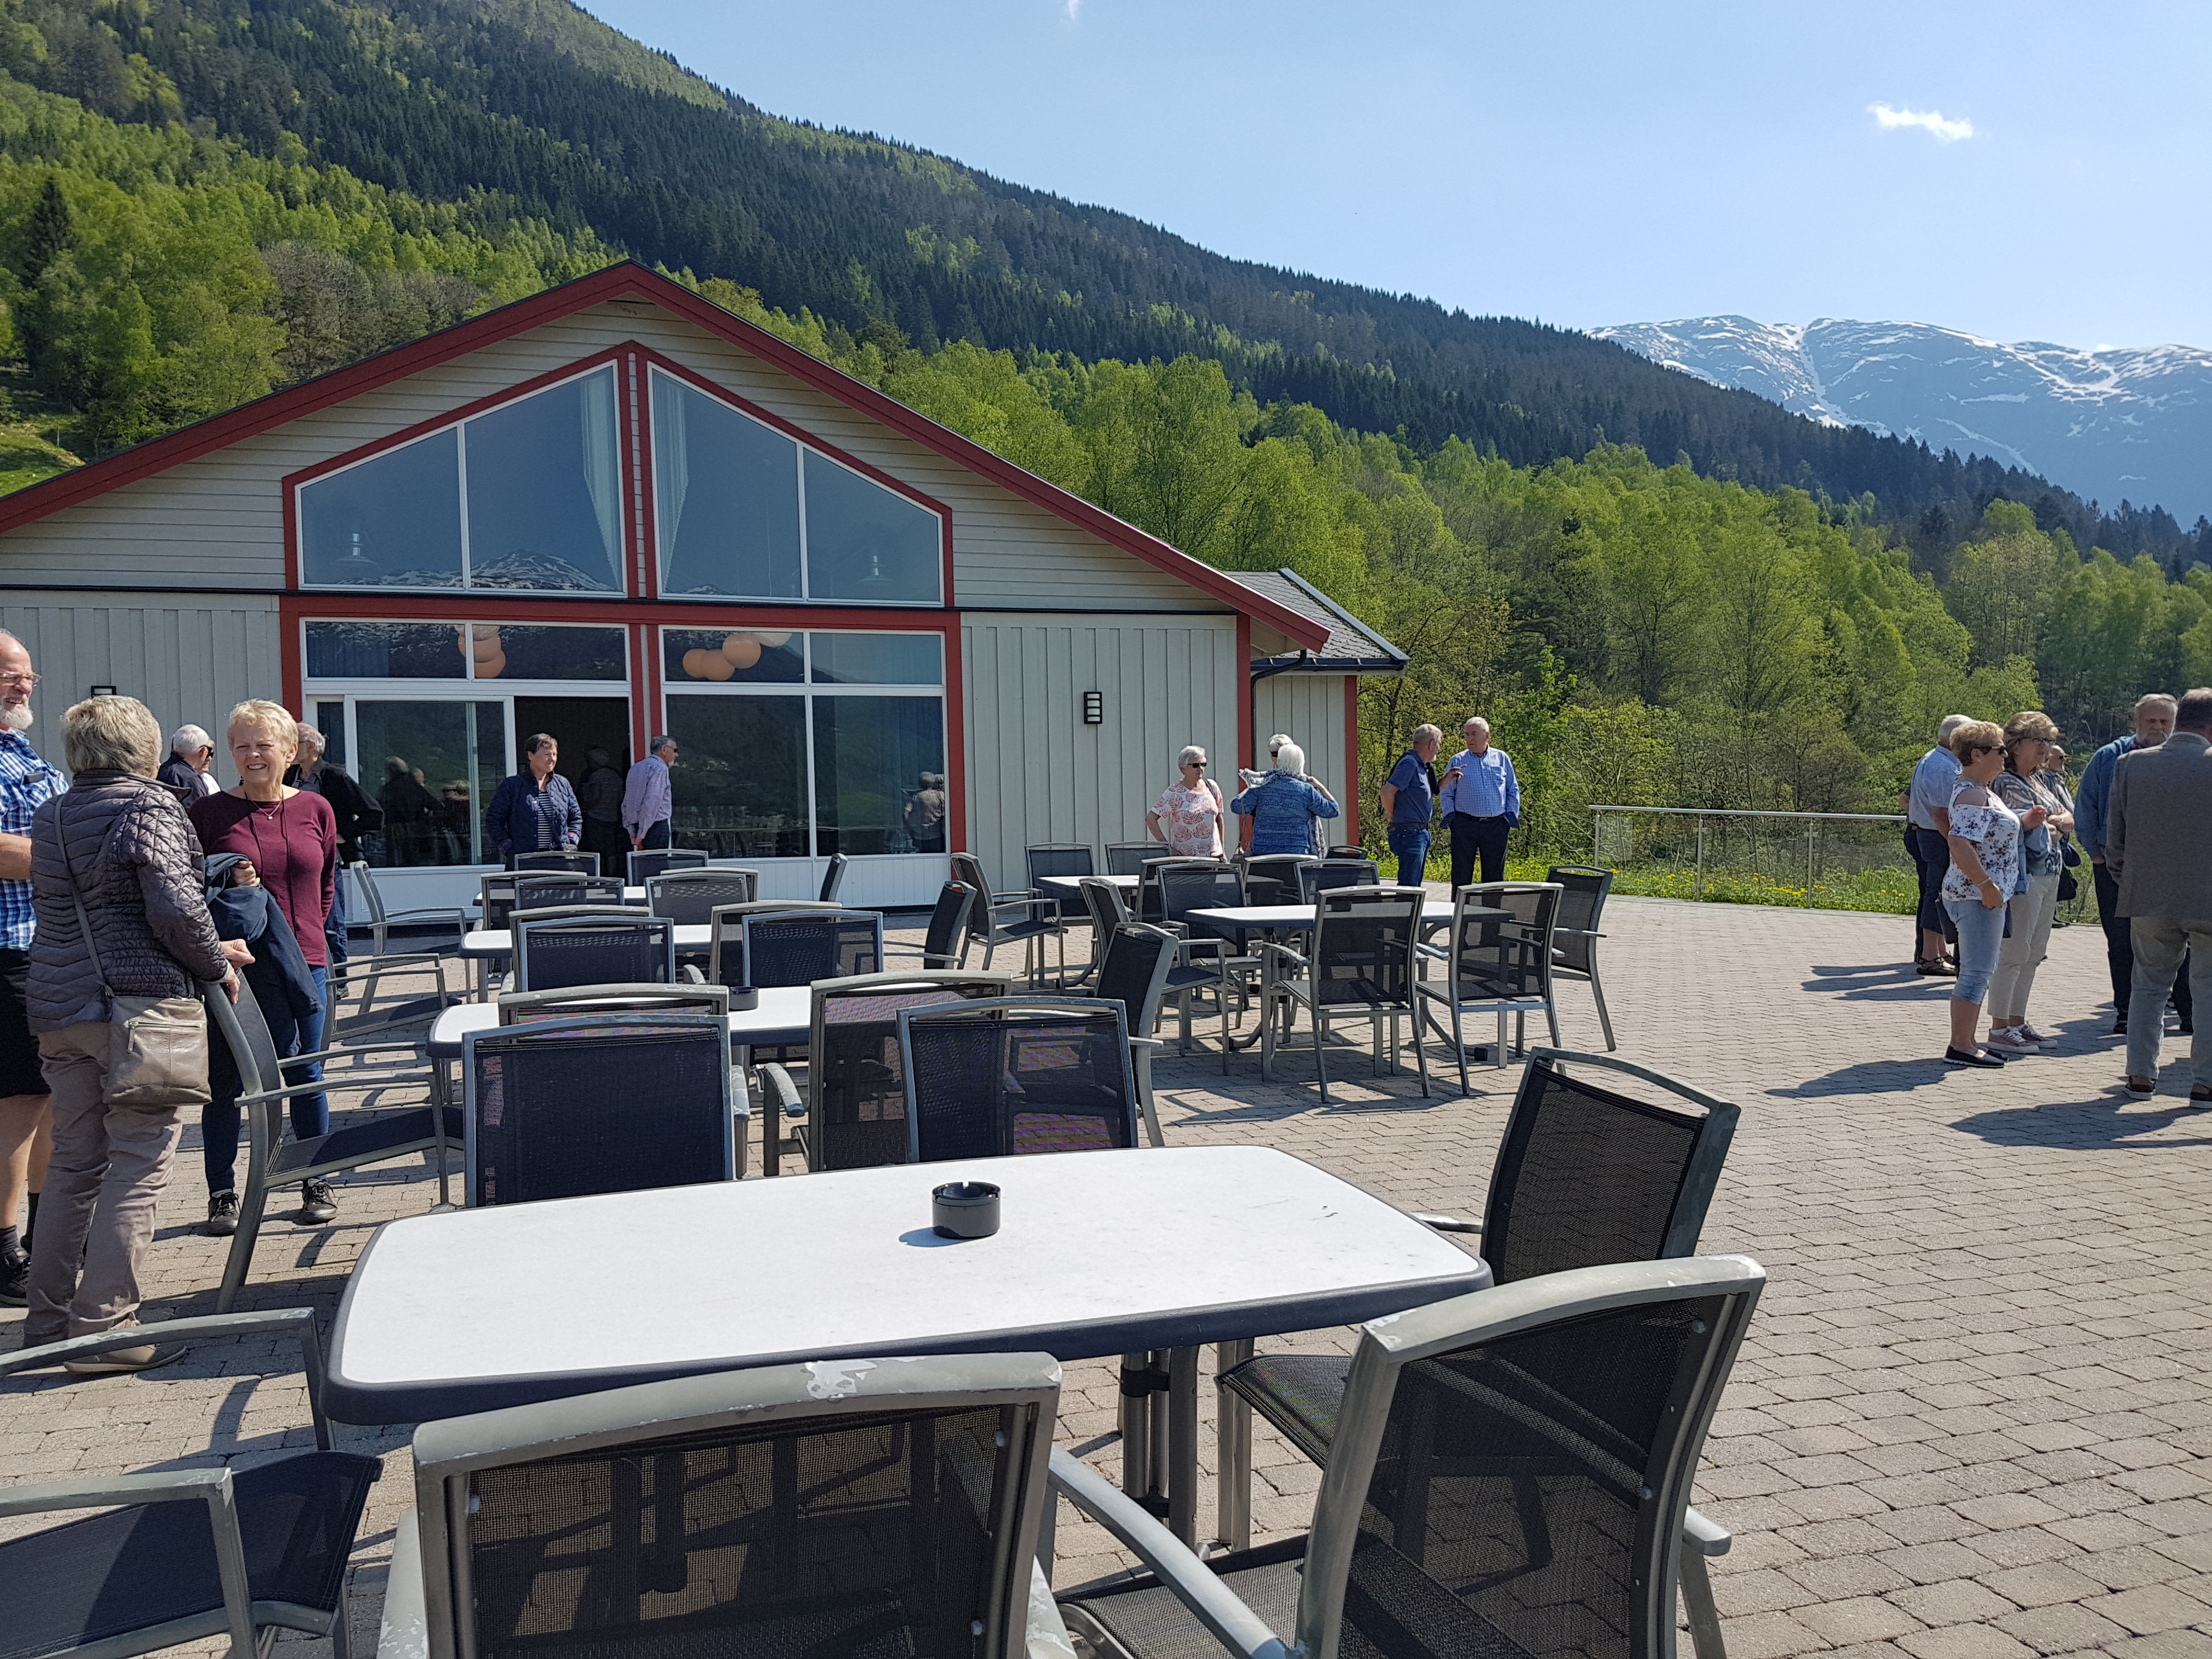 2018-05-14_Ulvik tur SV.jpg